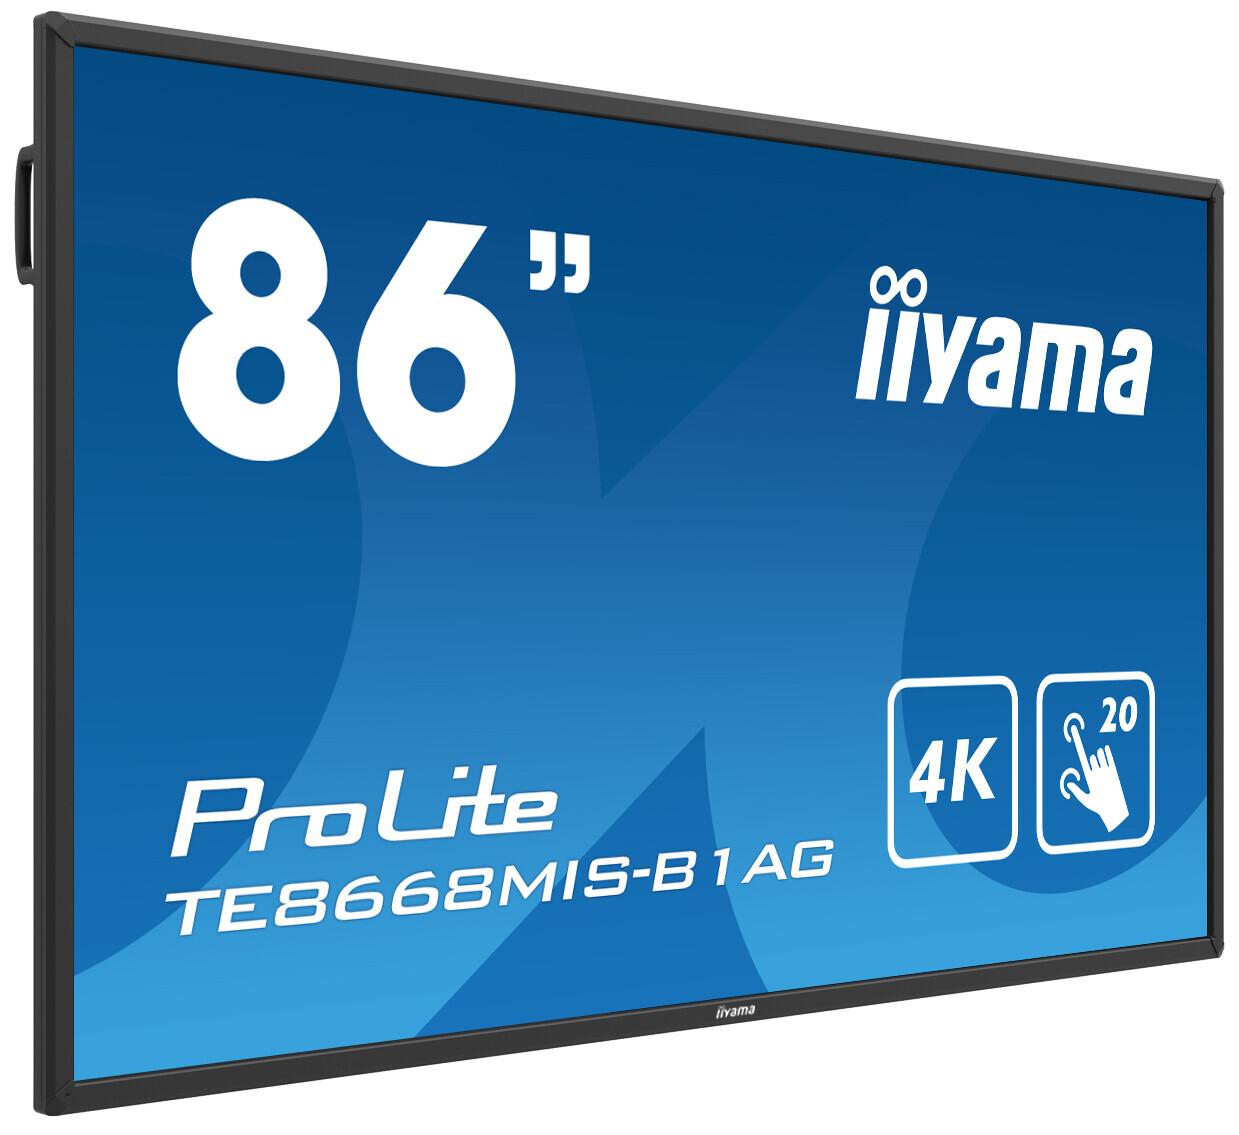 "iiyama ProLite TE8668MIS-B1AG 86"" Touchscreen mit 4K Auflösung"